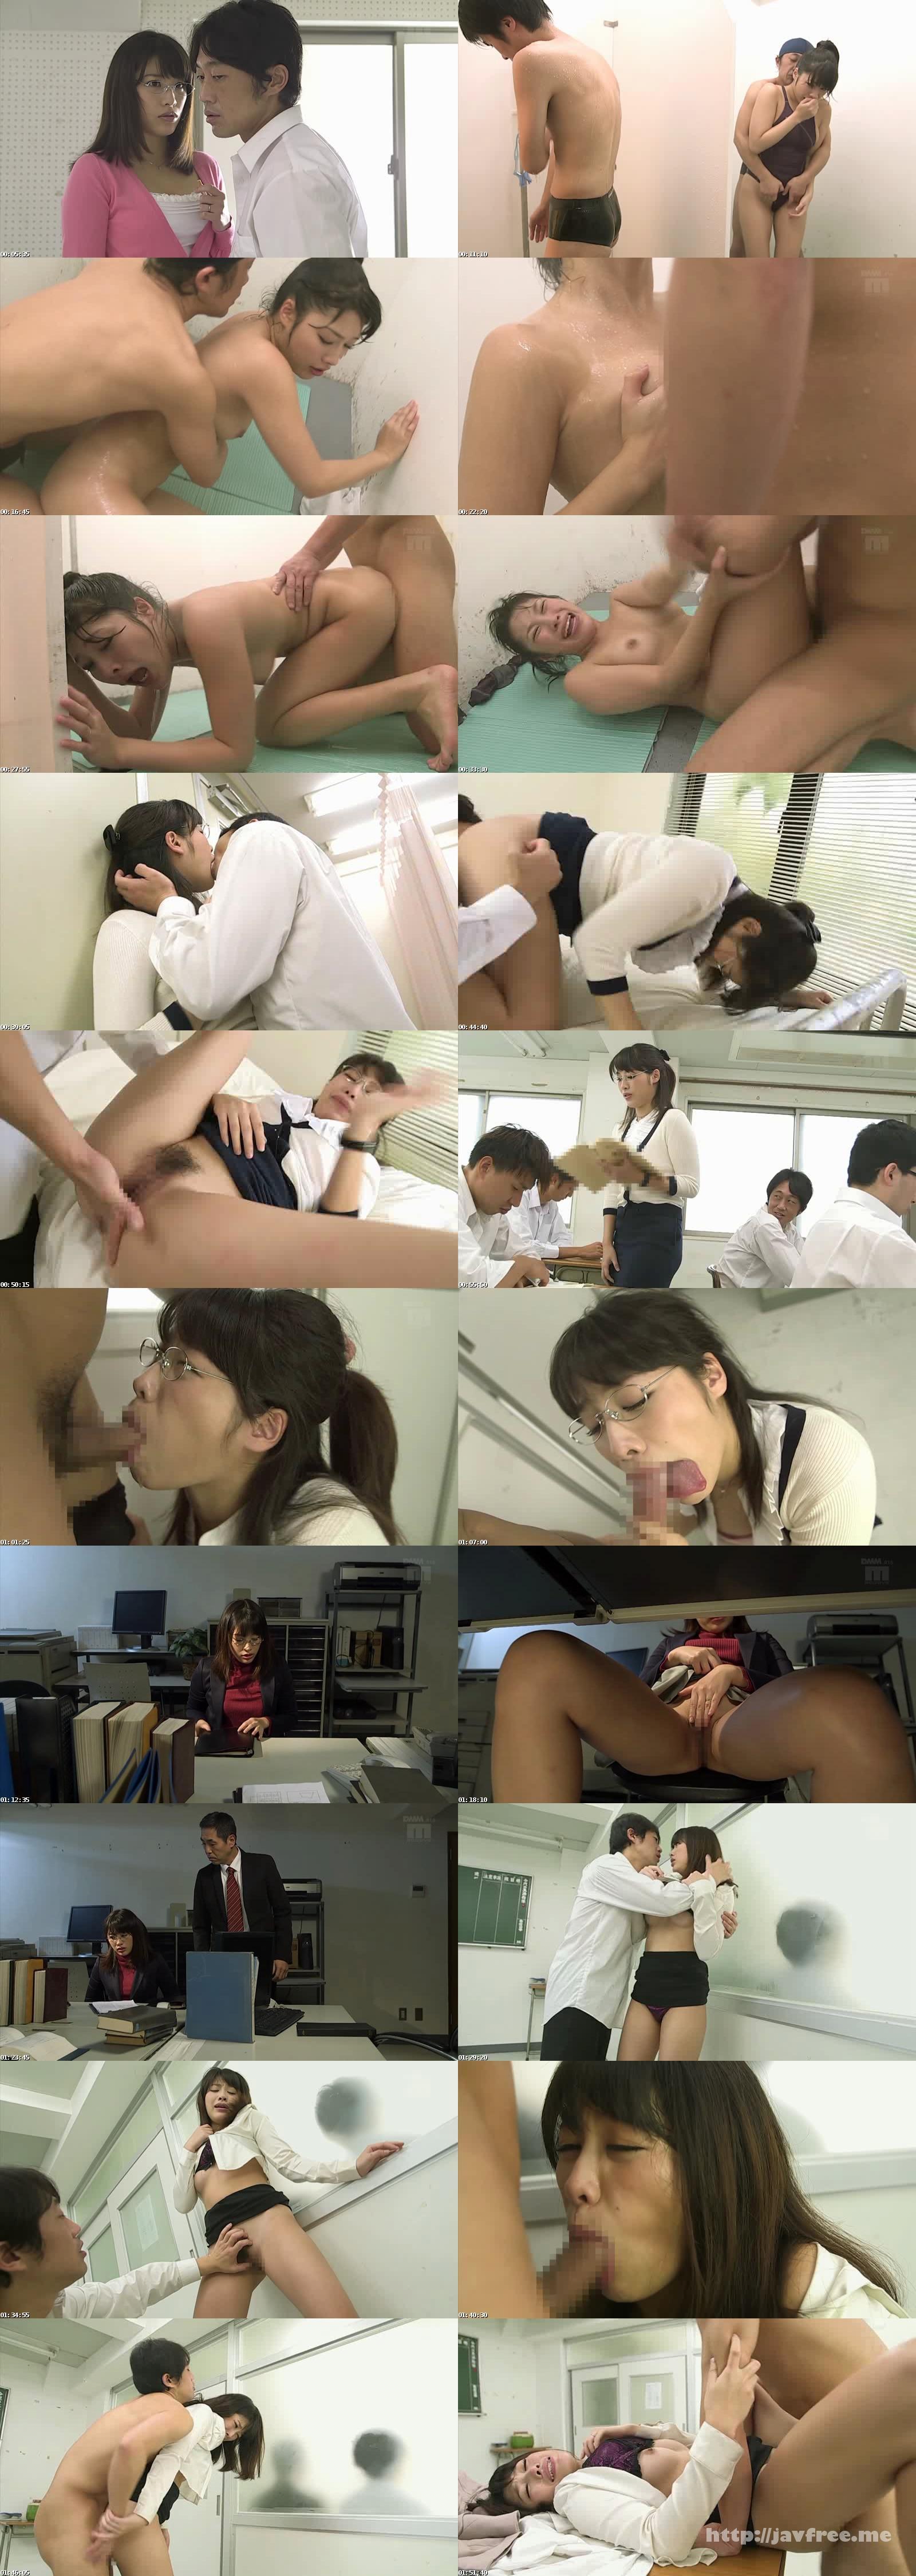 [MIAD-759] 女教師 勤務中の声を押し殺す絶頂 春原未来 - image MIAD-759 on https://javfree.me